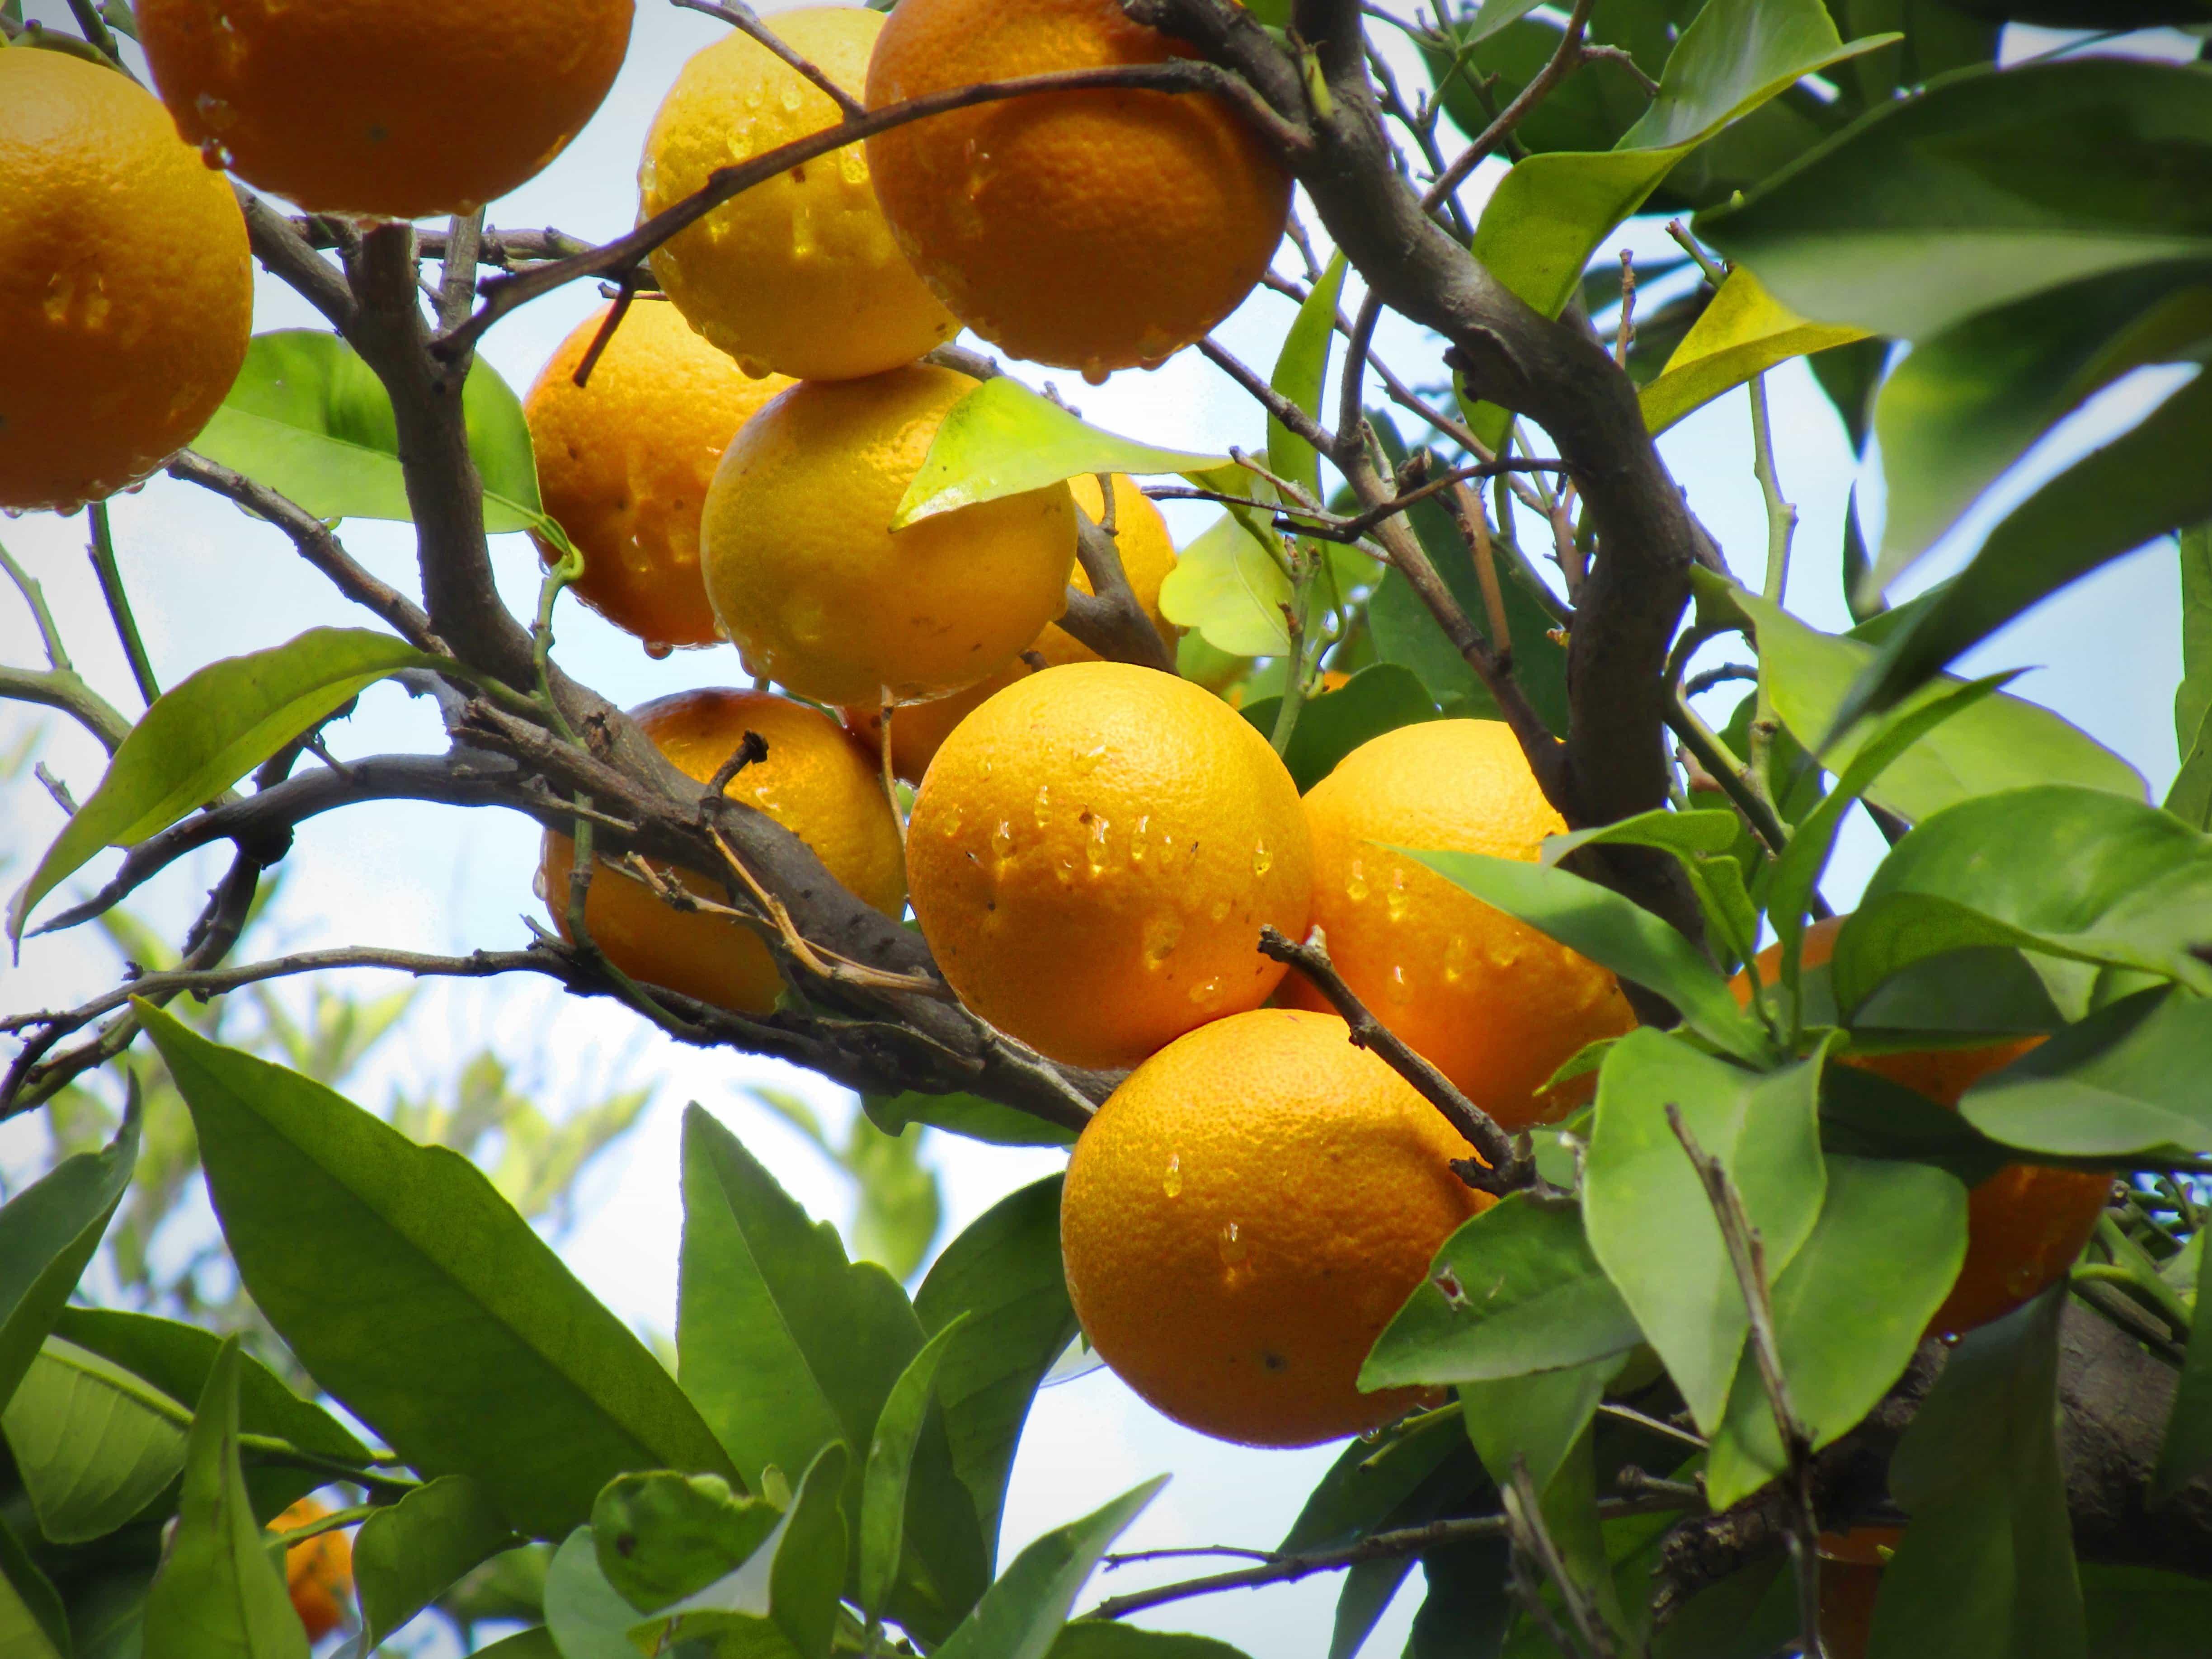 Free picture: citrus, branch, nature, leaf, food, organic, orange tree, rain, tropical fruit